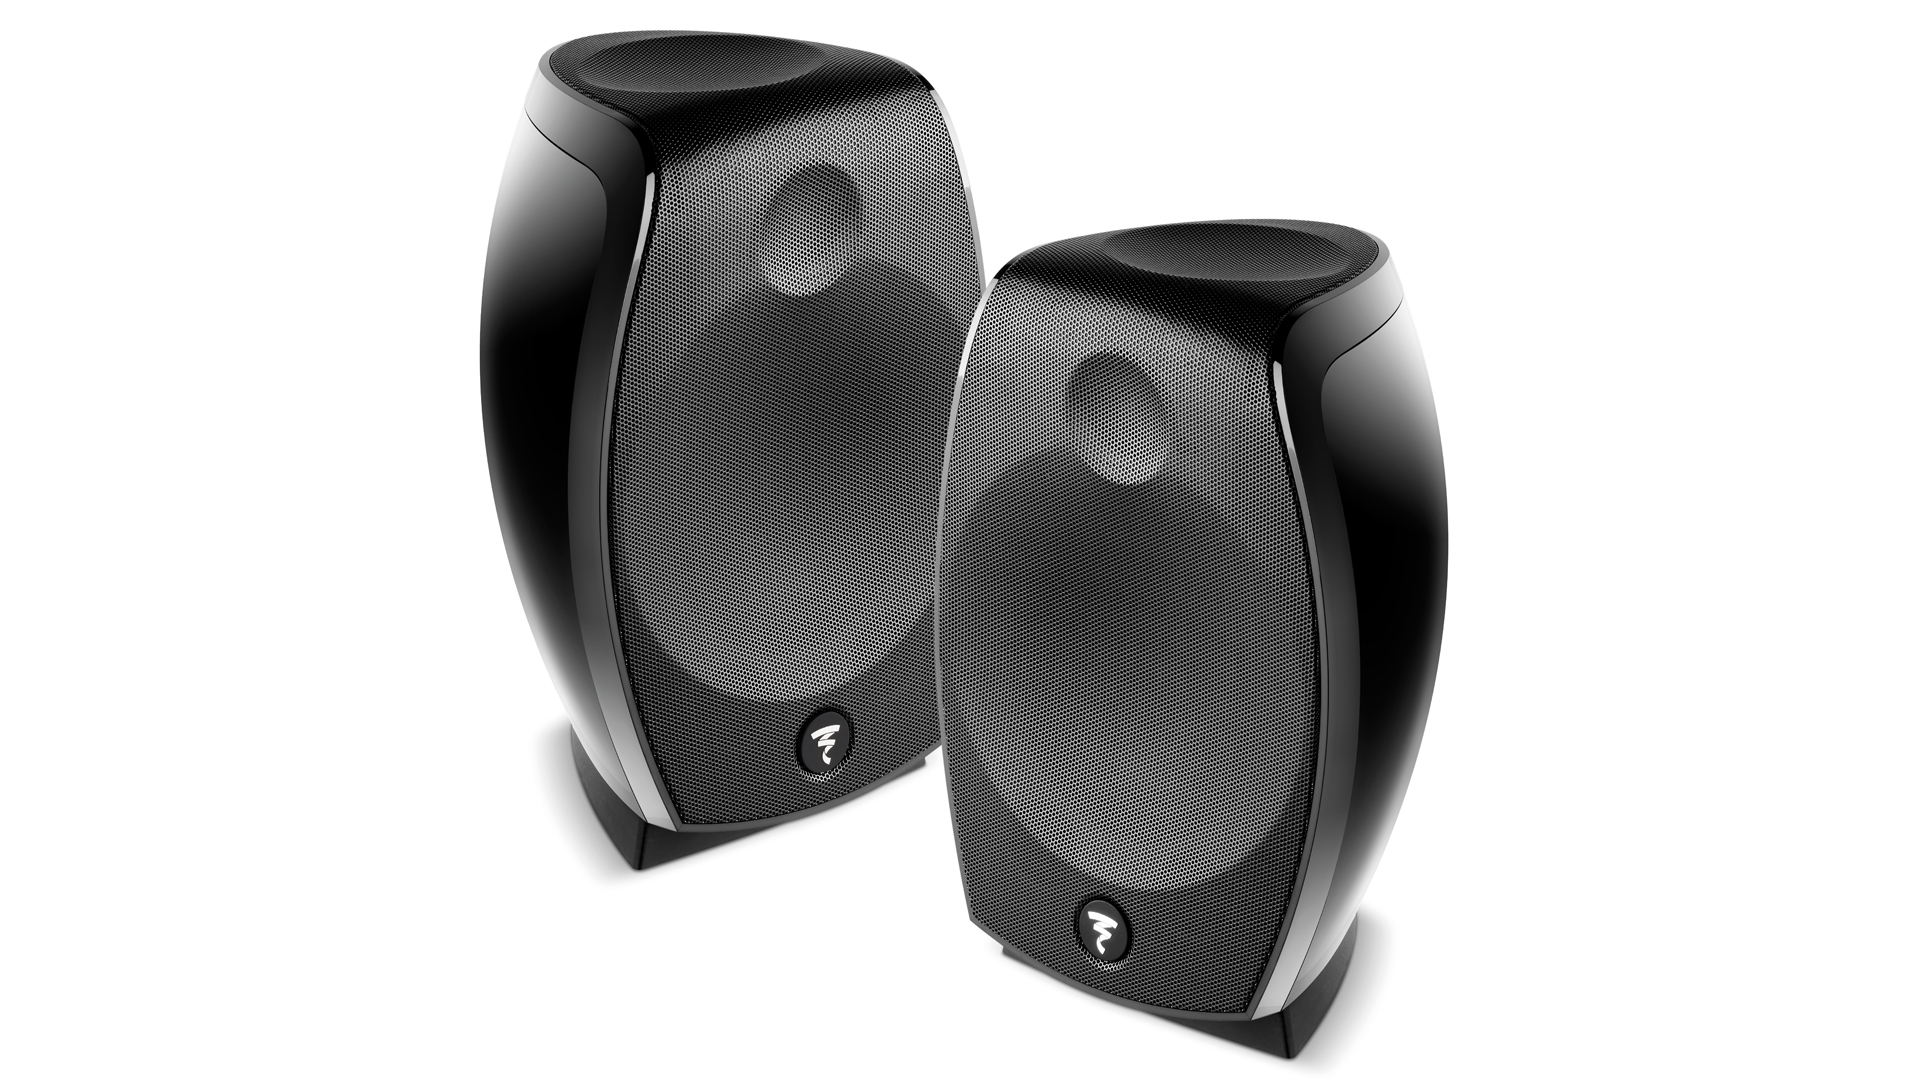 A photo of the Focal Sib Evo speakers